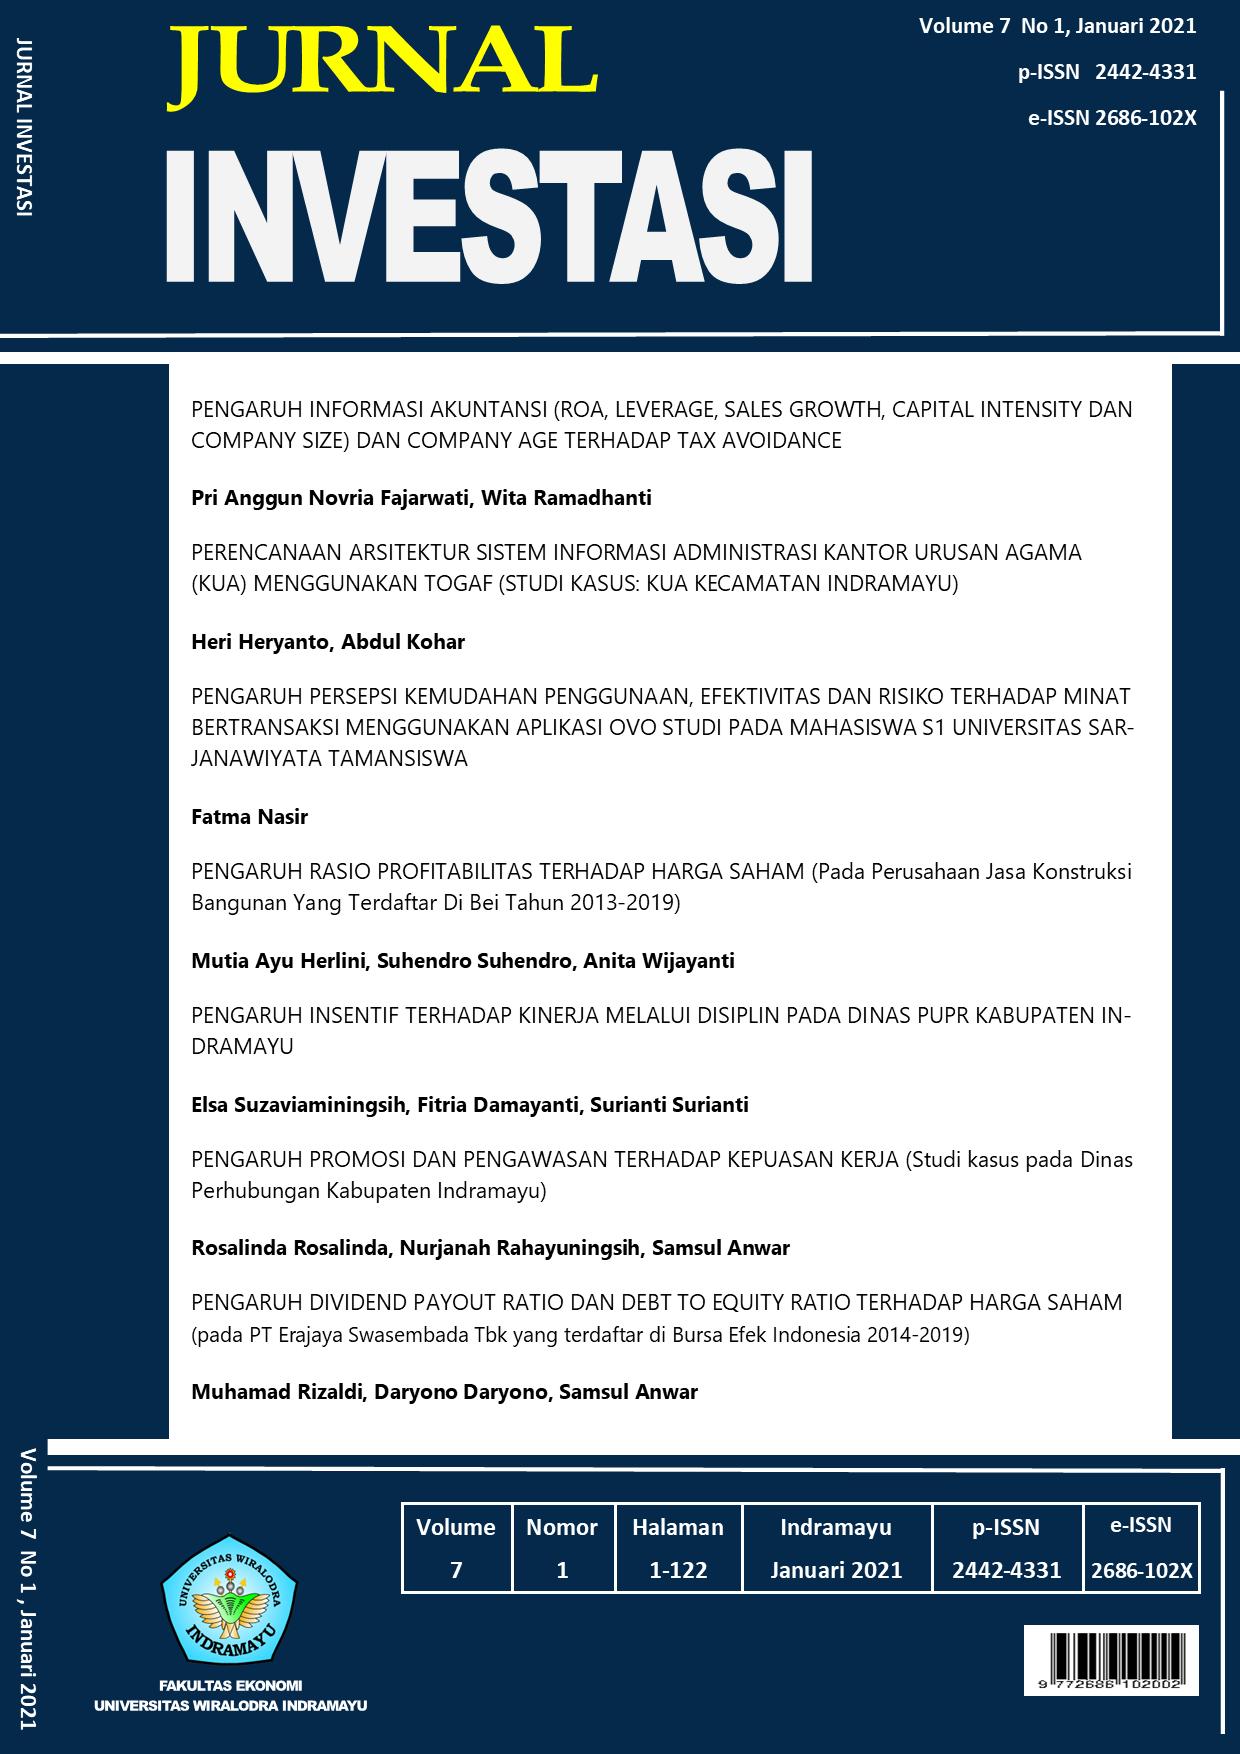 View Vol. 7 No. 1 (2021): Jurnal Investasi Januari 2021